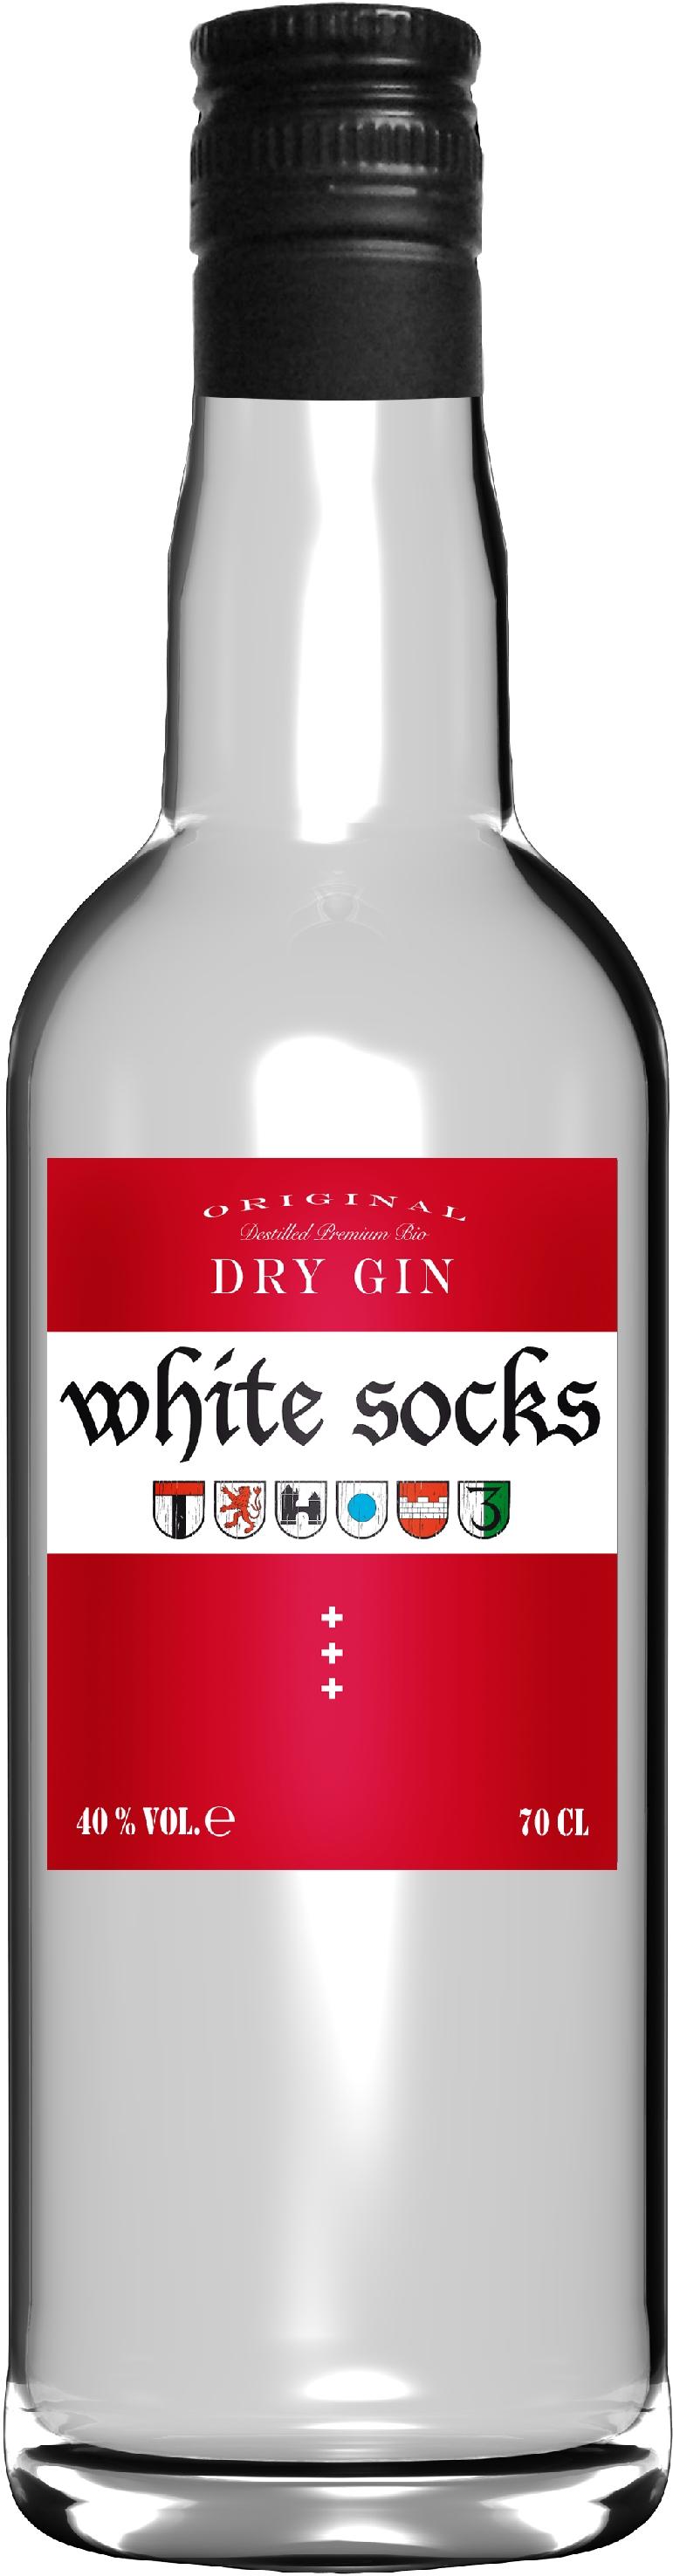 gin white socks